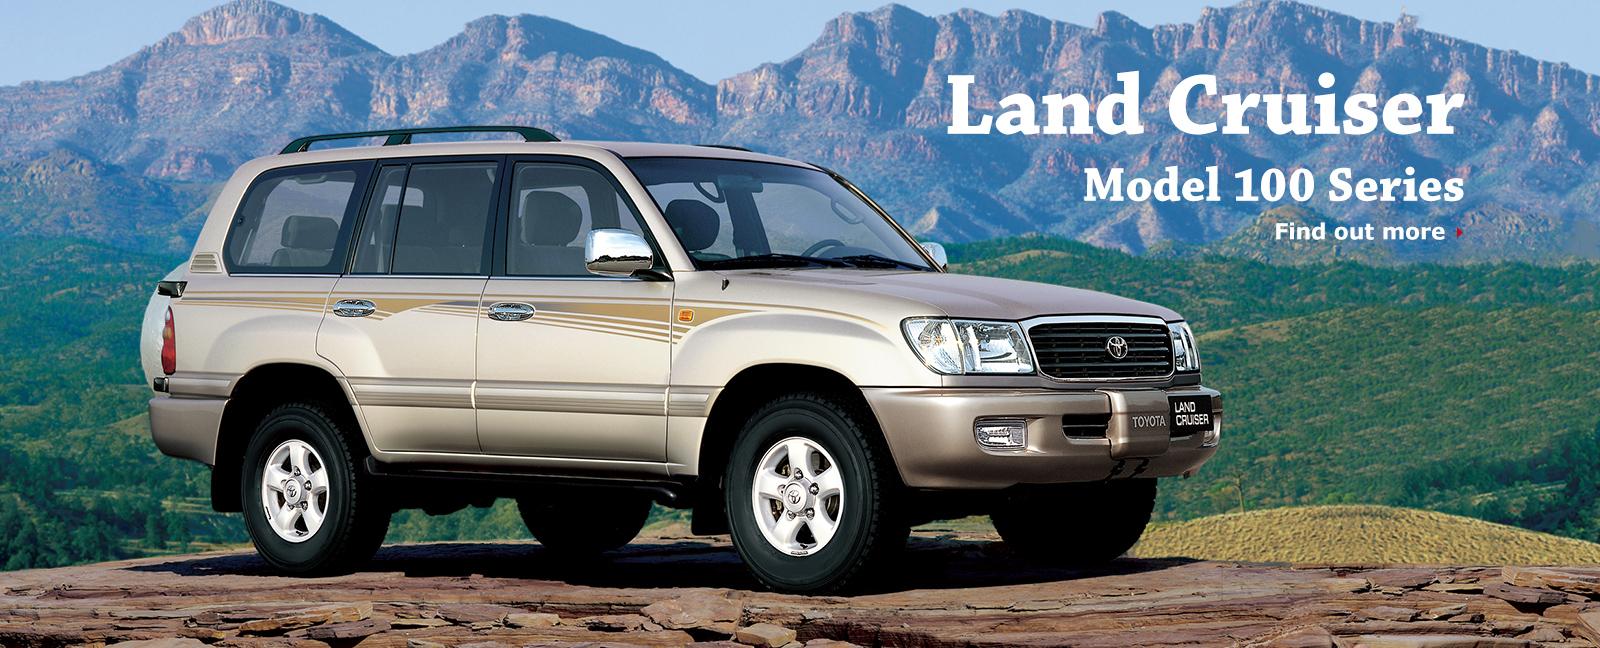 Toyota Land Cruiser 100 Series 1997 - 2002 SUV 5 door #1